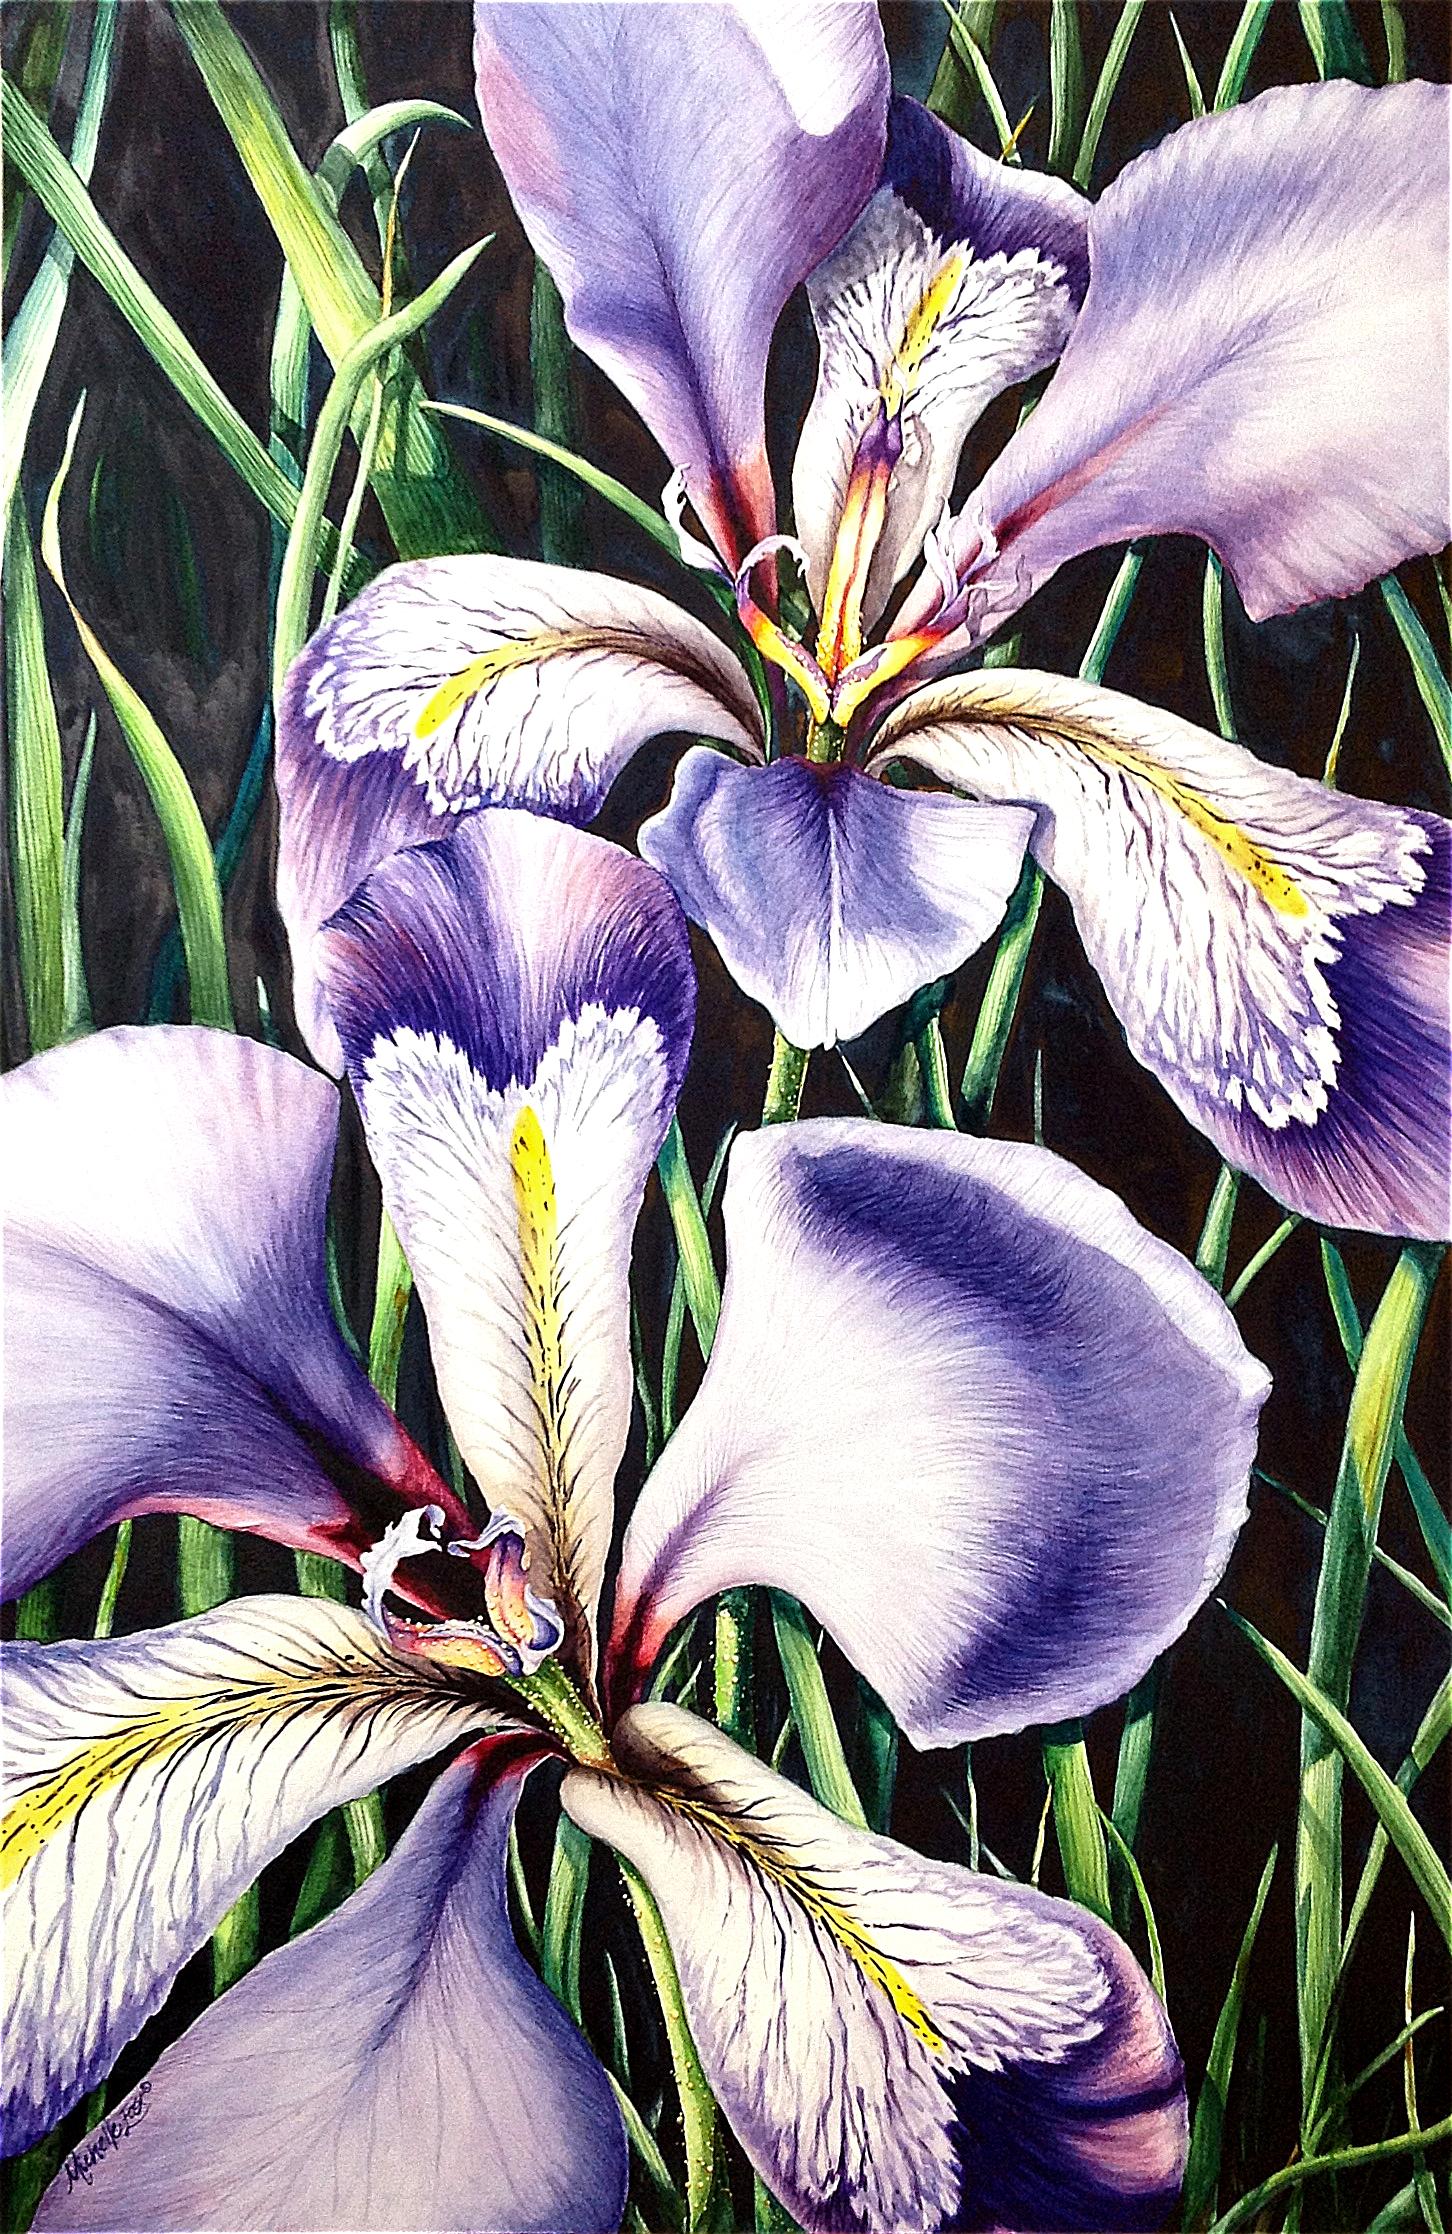 Iris rhapsody michelle east art louisiana irises watercolor painting by michelle east izmirmasajfo